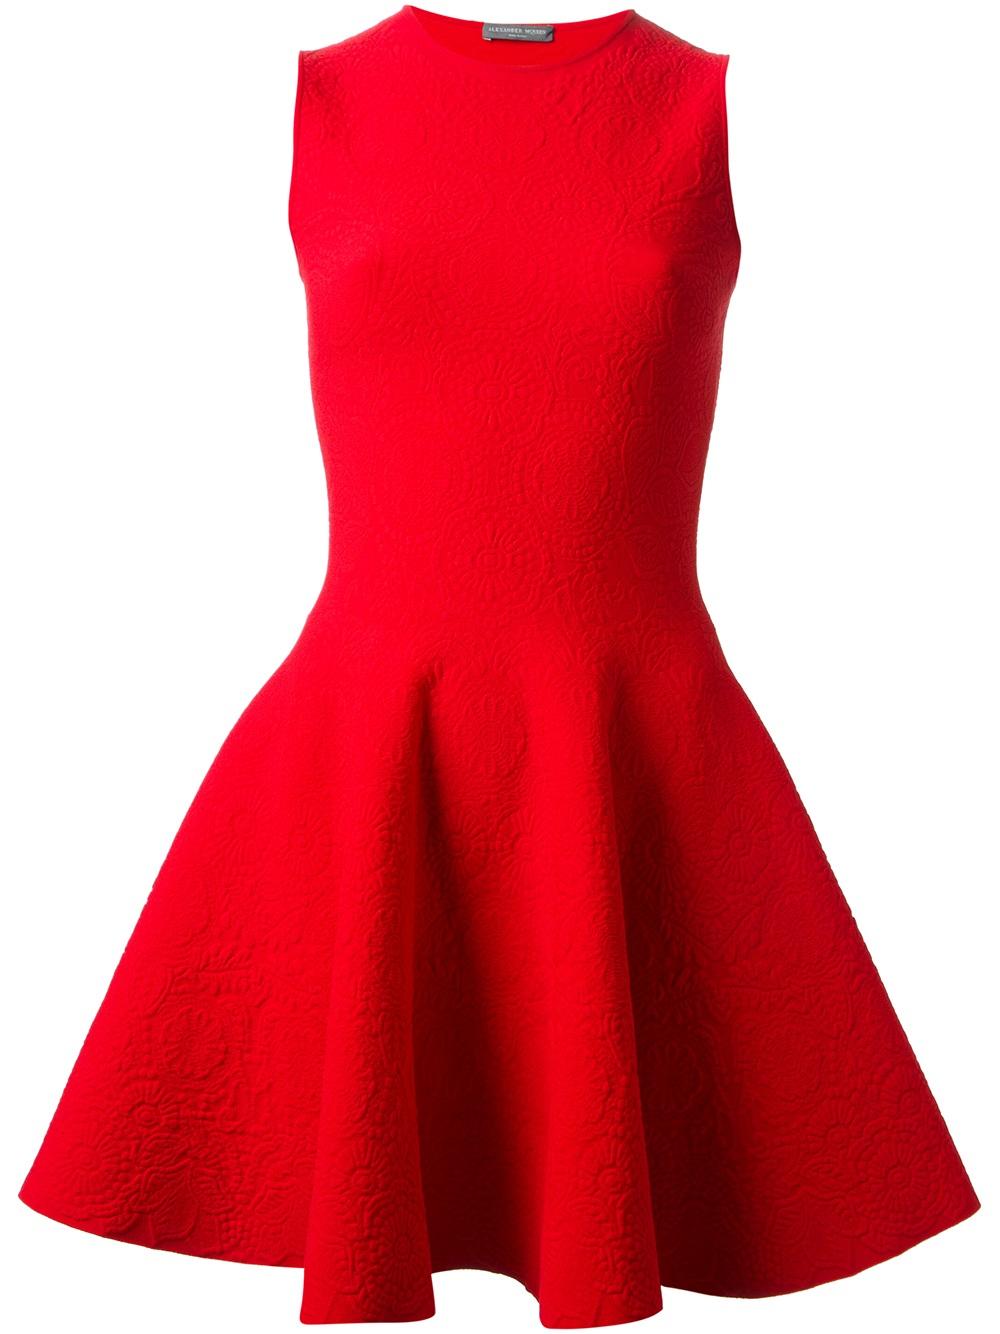 Alexander Mcqueen Flared Skater Dress In Red Lyst